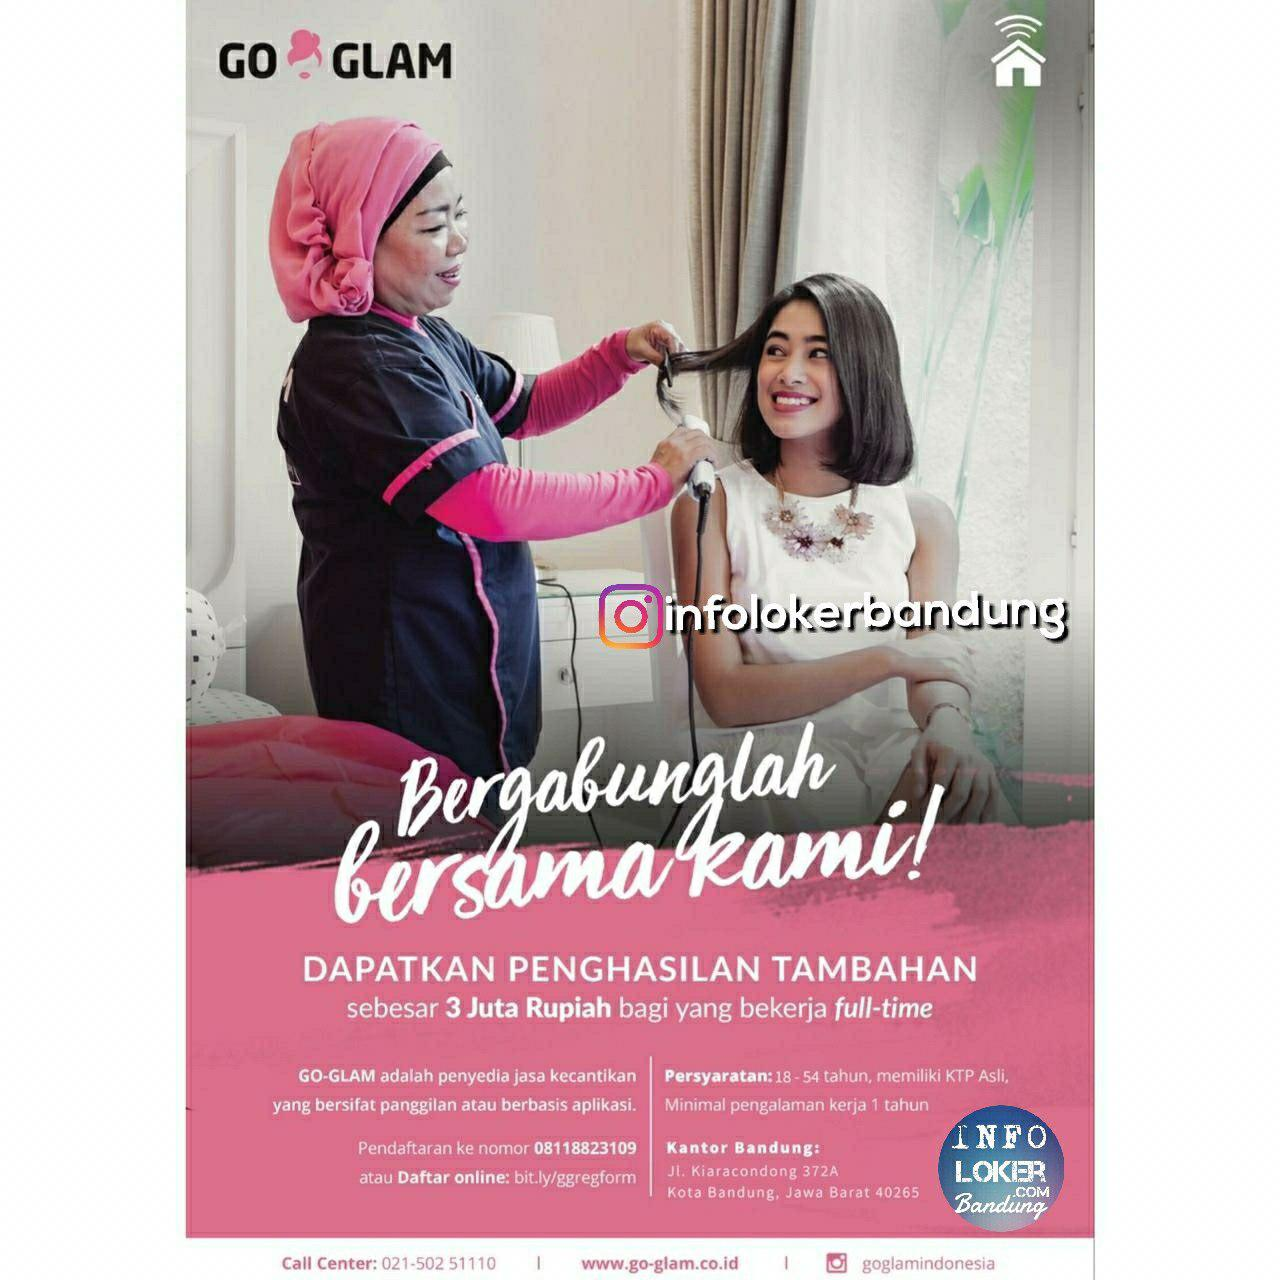 Lowongan Kerja Talent Go Glam Bandung September 2018